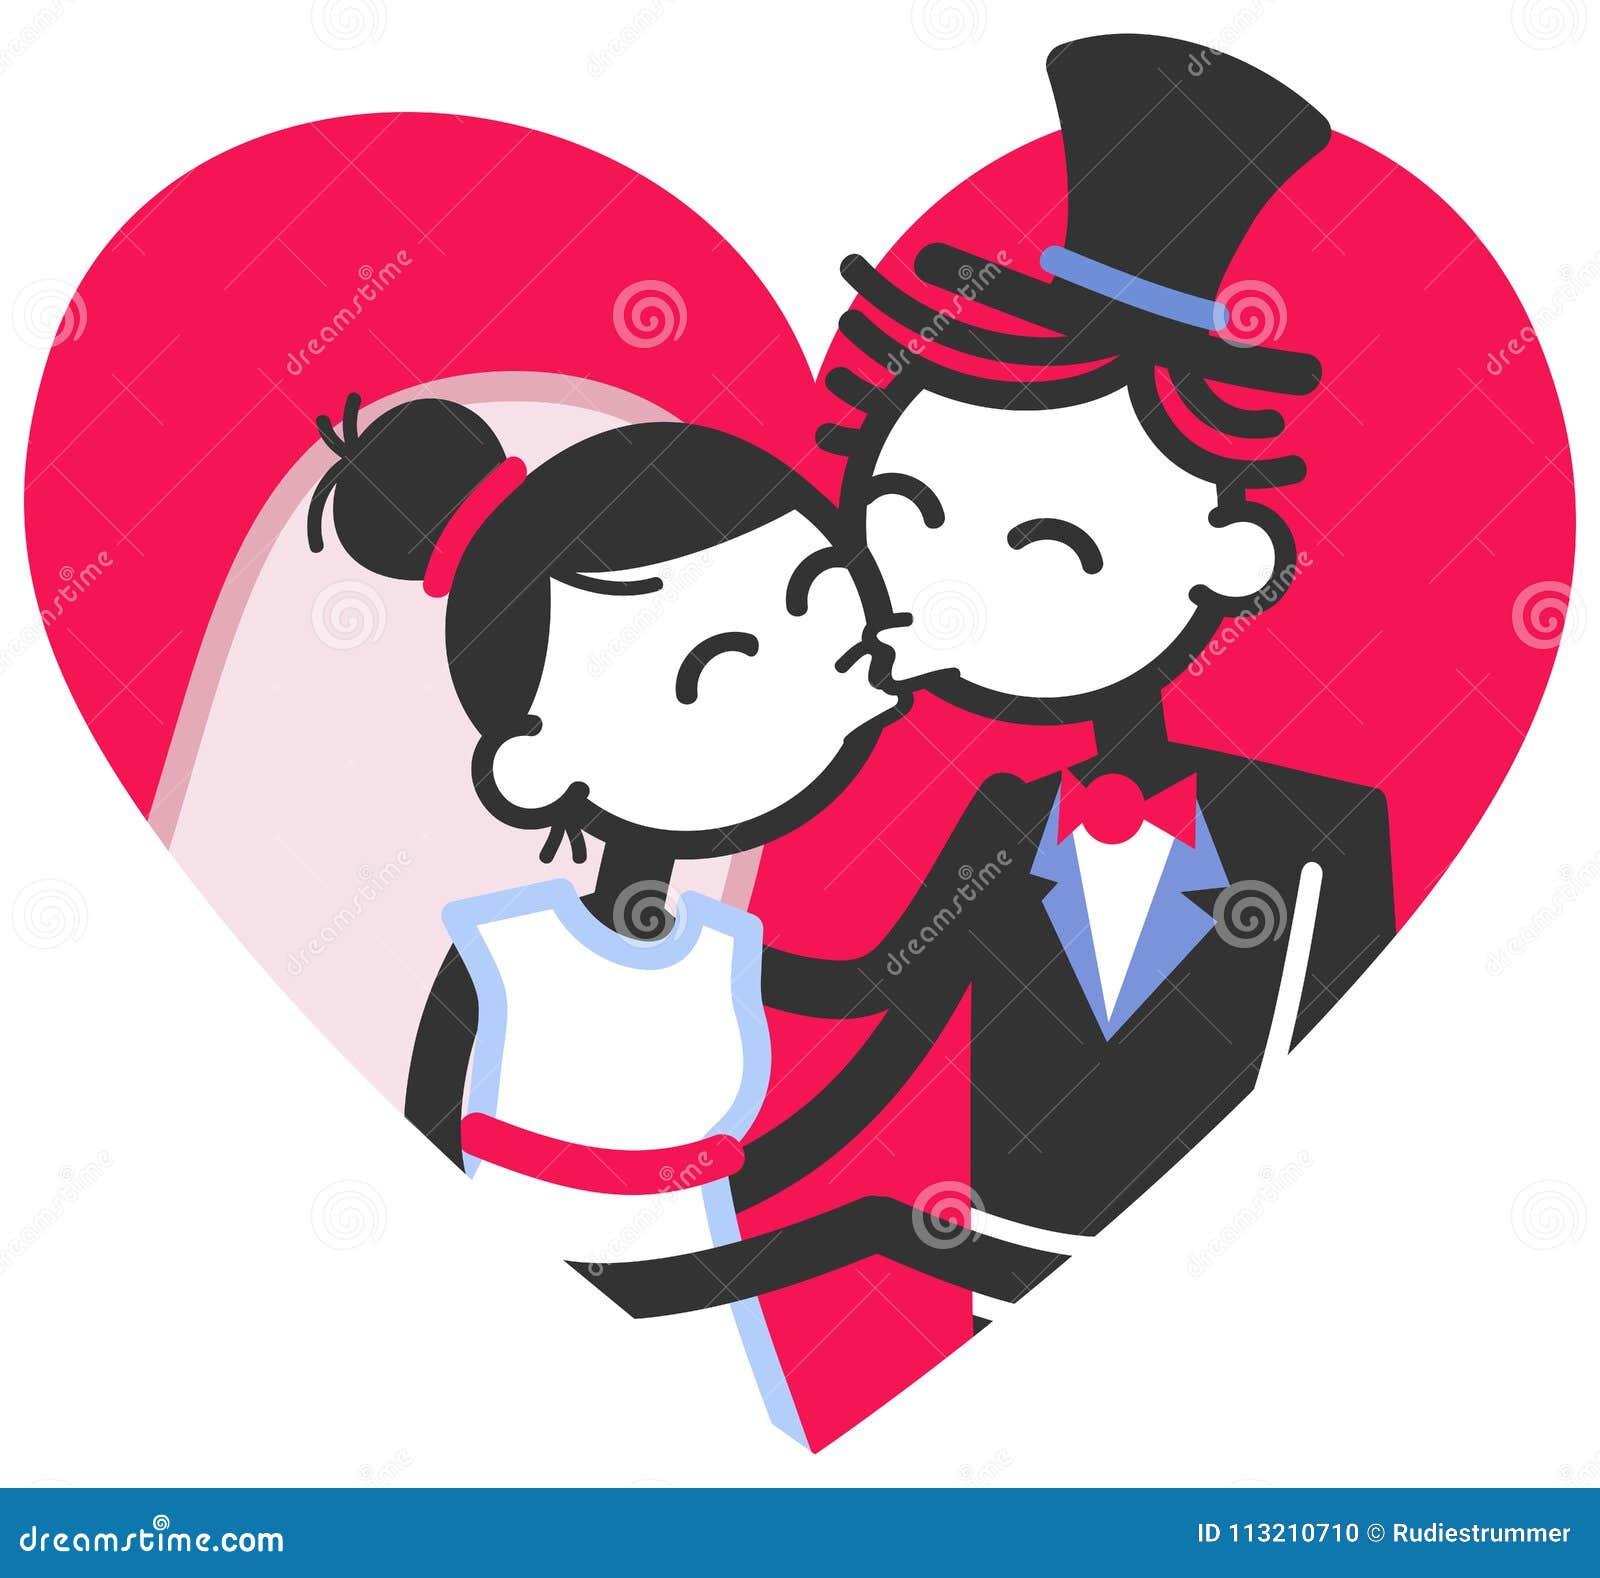 vector wedding illustration of cute stick figures bridal couple